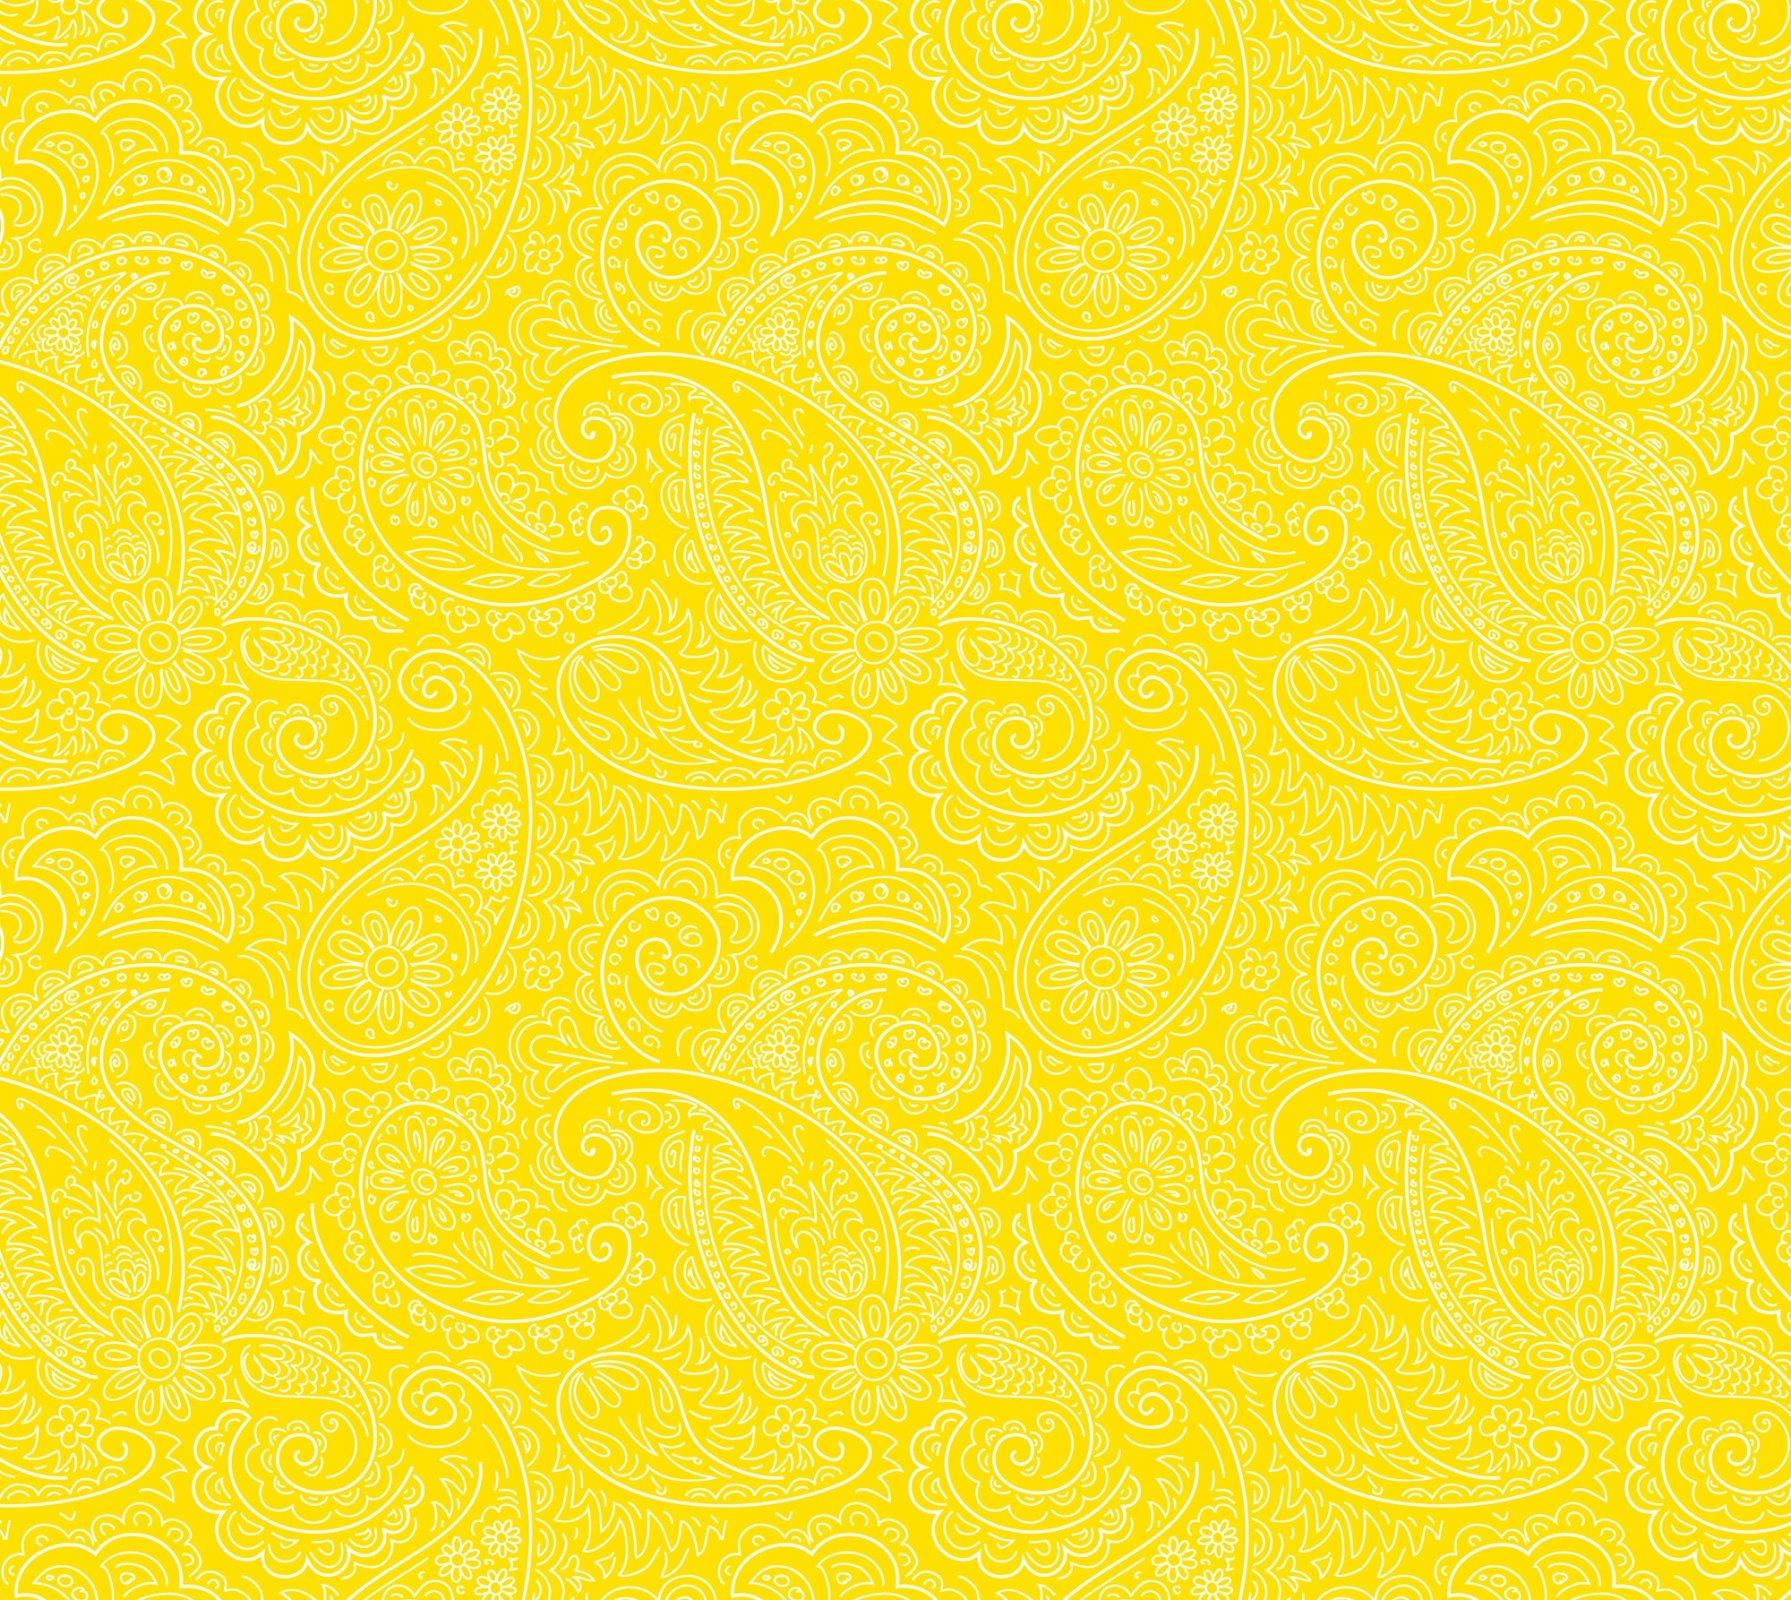 DT-Rosette Garden DX-1784-0C-15 Golds - Drawn Paisley